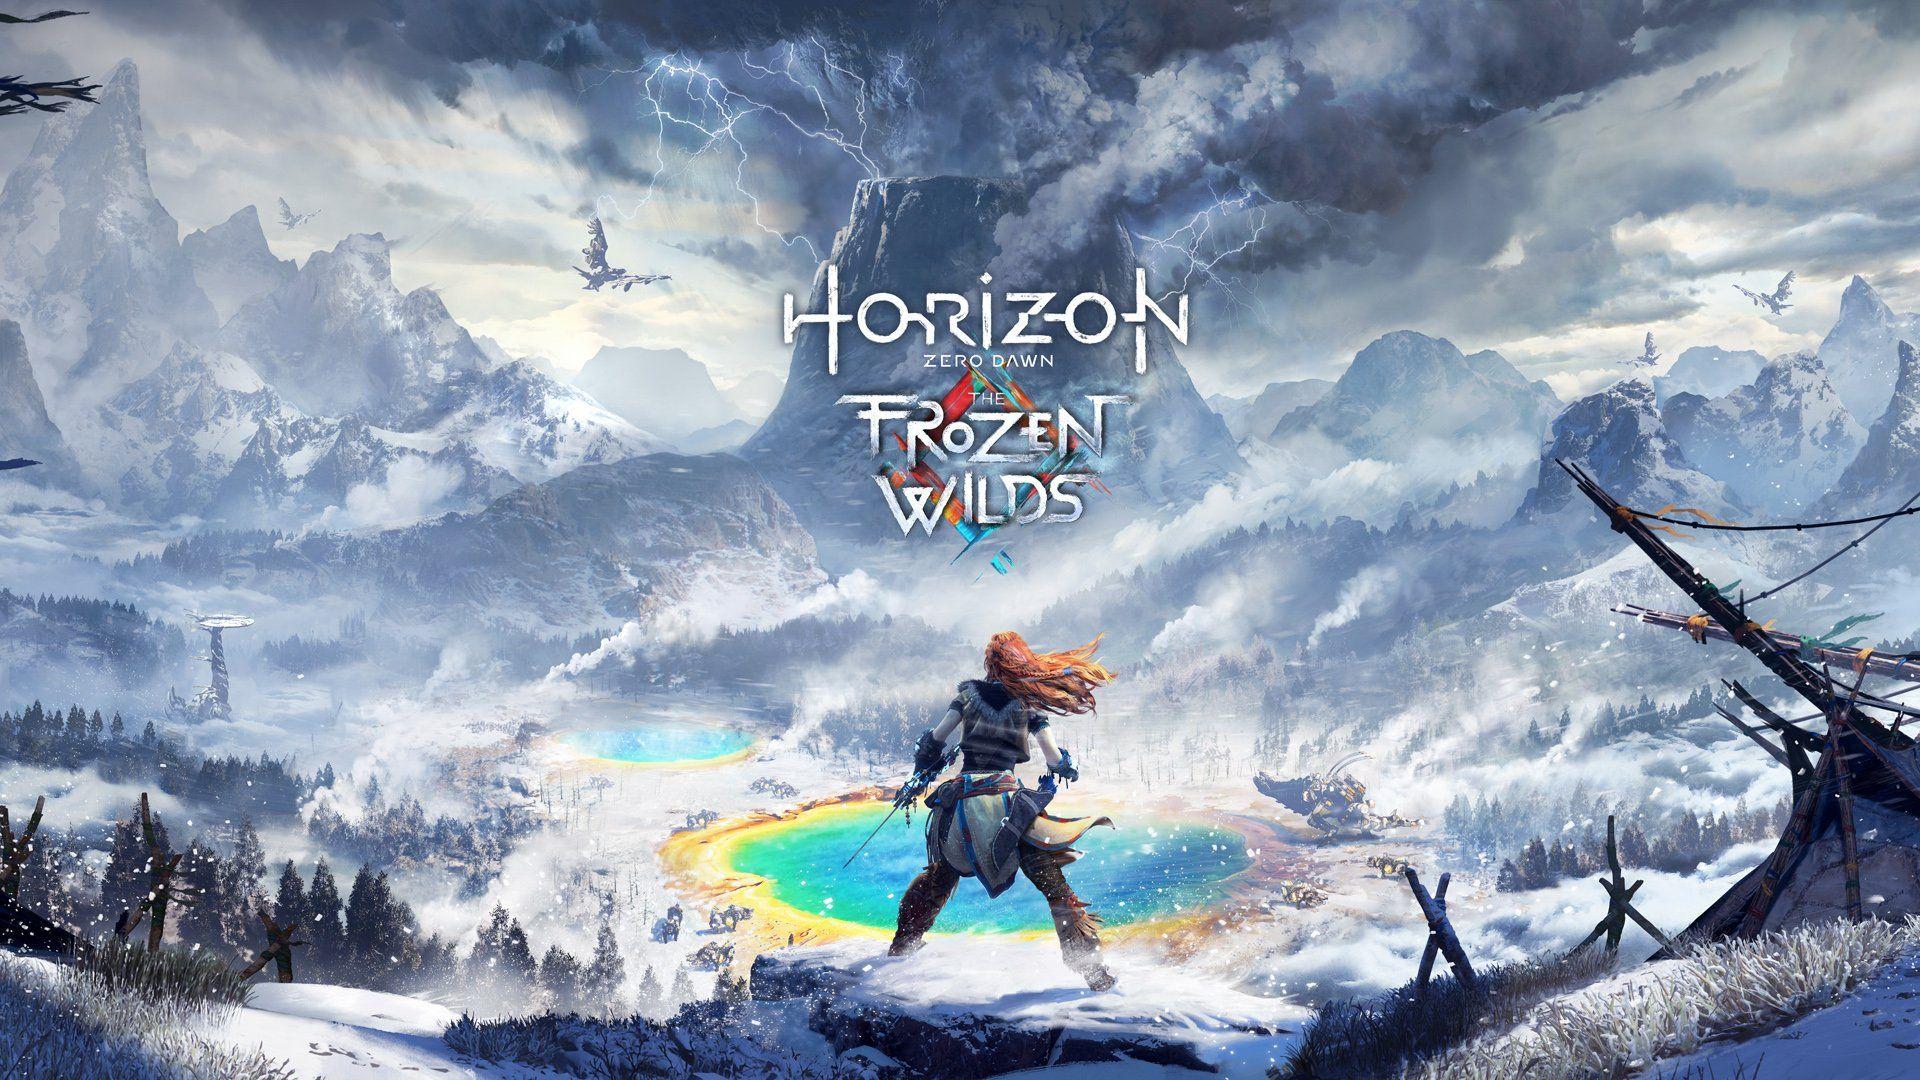 The Frozen Wild DLC Horizon Ecran Titre PS4